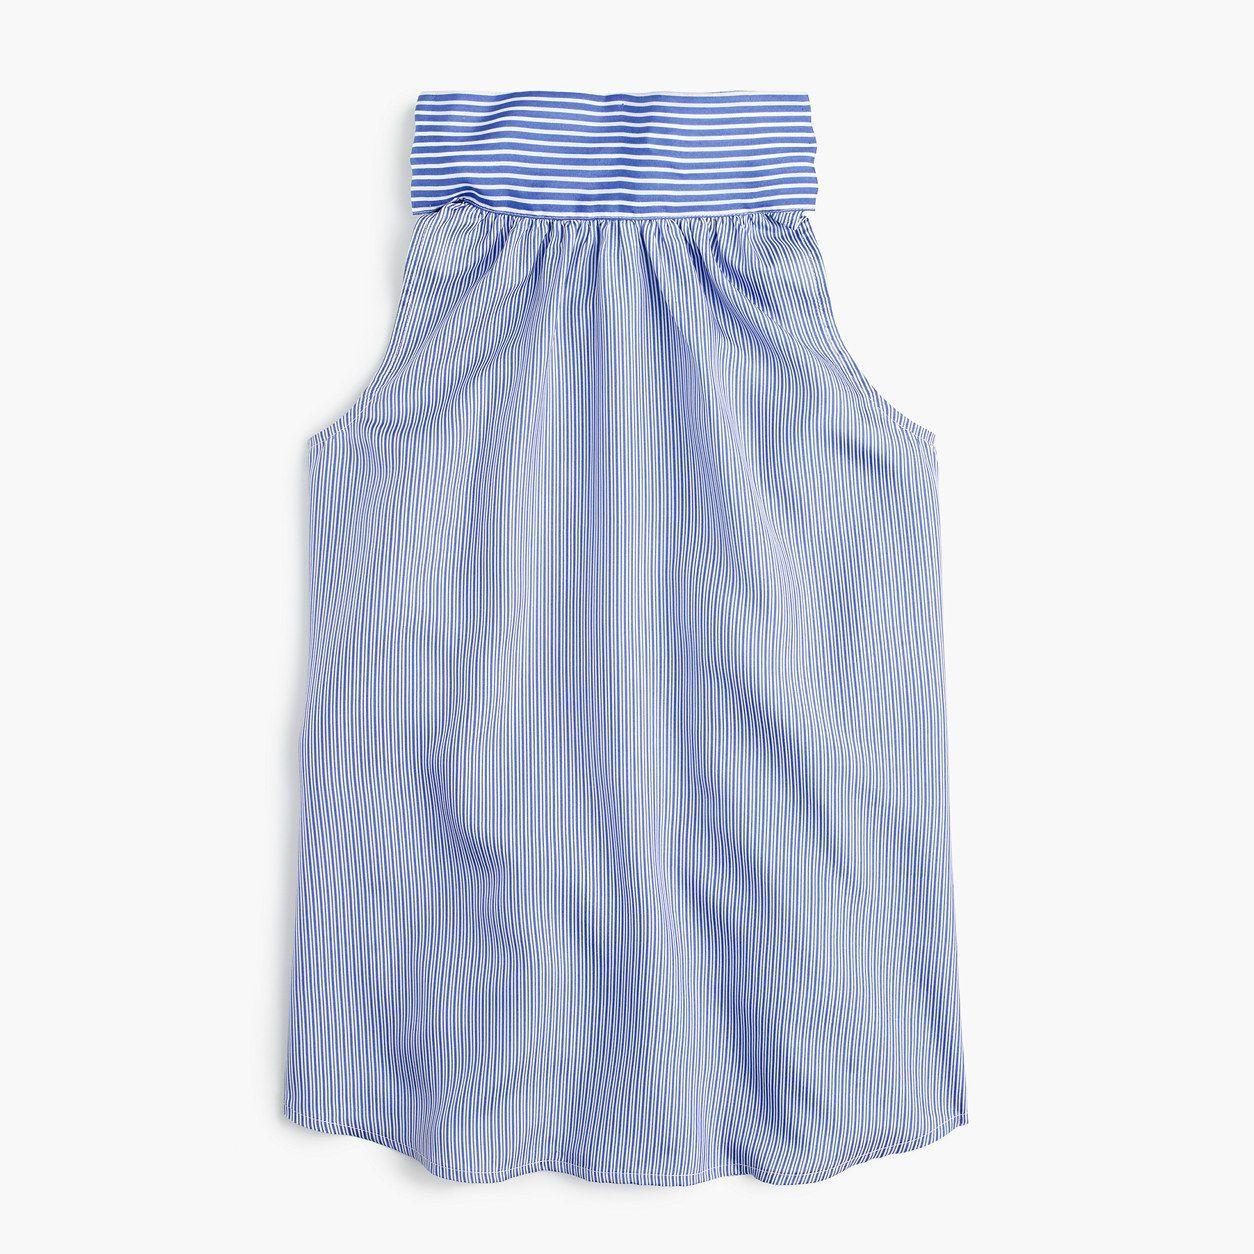 J.Crew Womens Petite Tie-Neck Top In Striped Silk (Size 10 Petite)